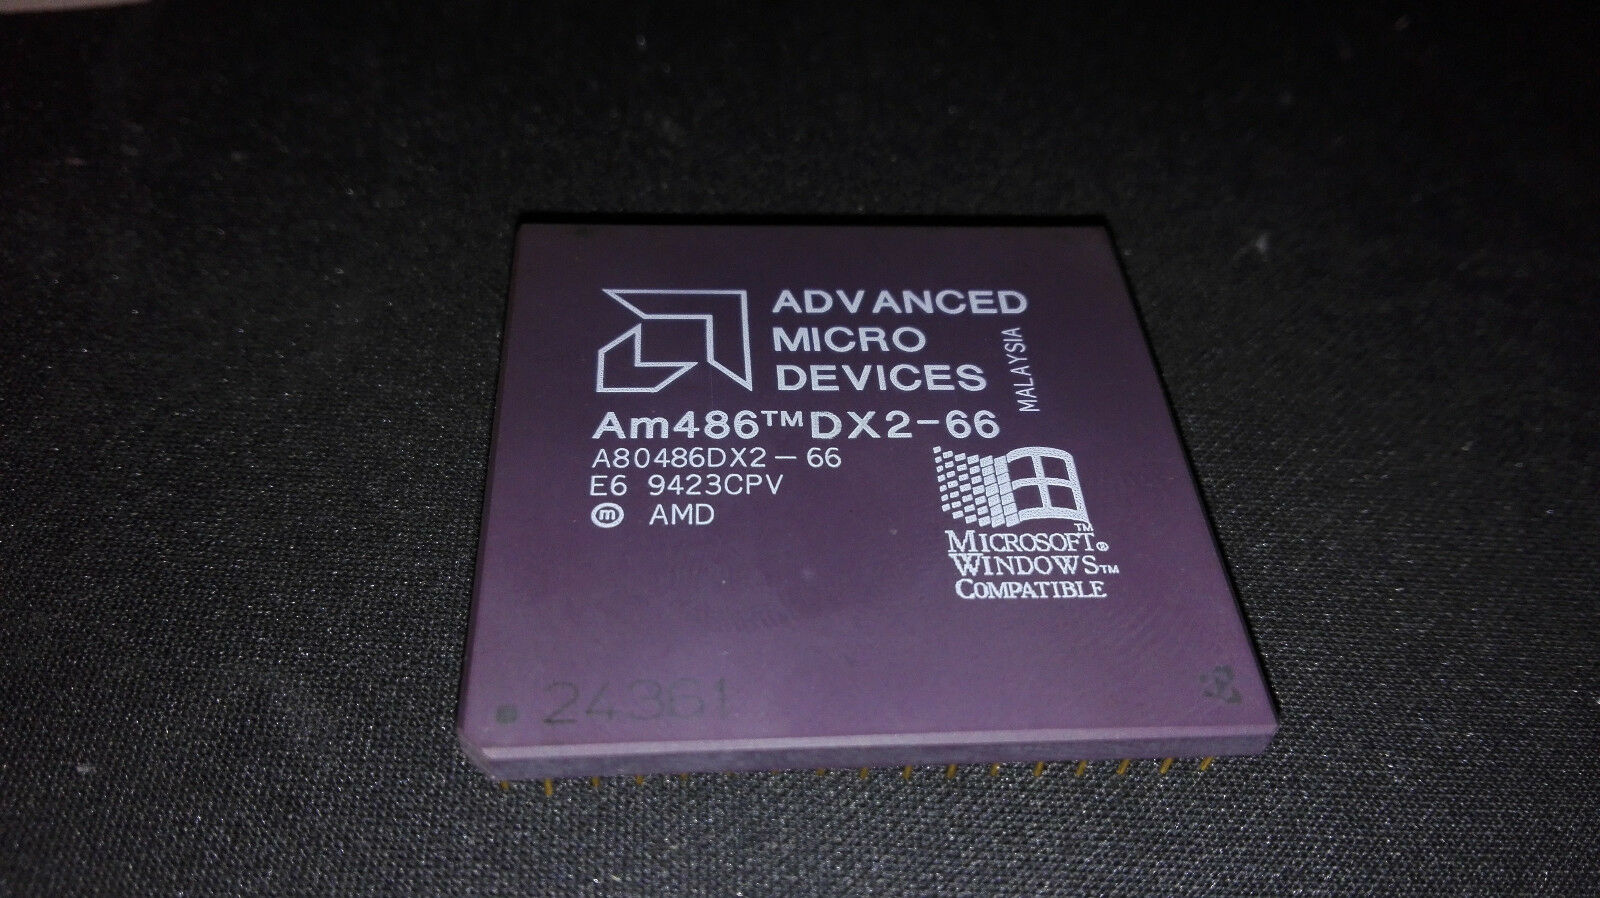 vintage cpu processor AMD Am486 486 DX2-66 66MHZ A80486DX2-66